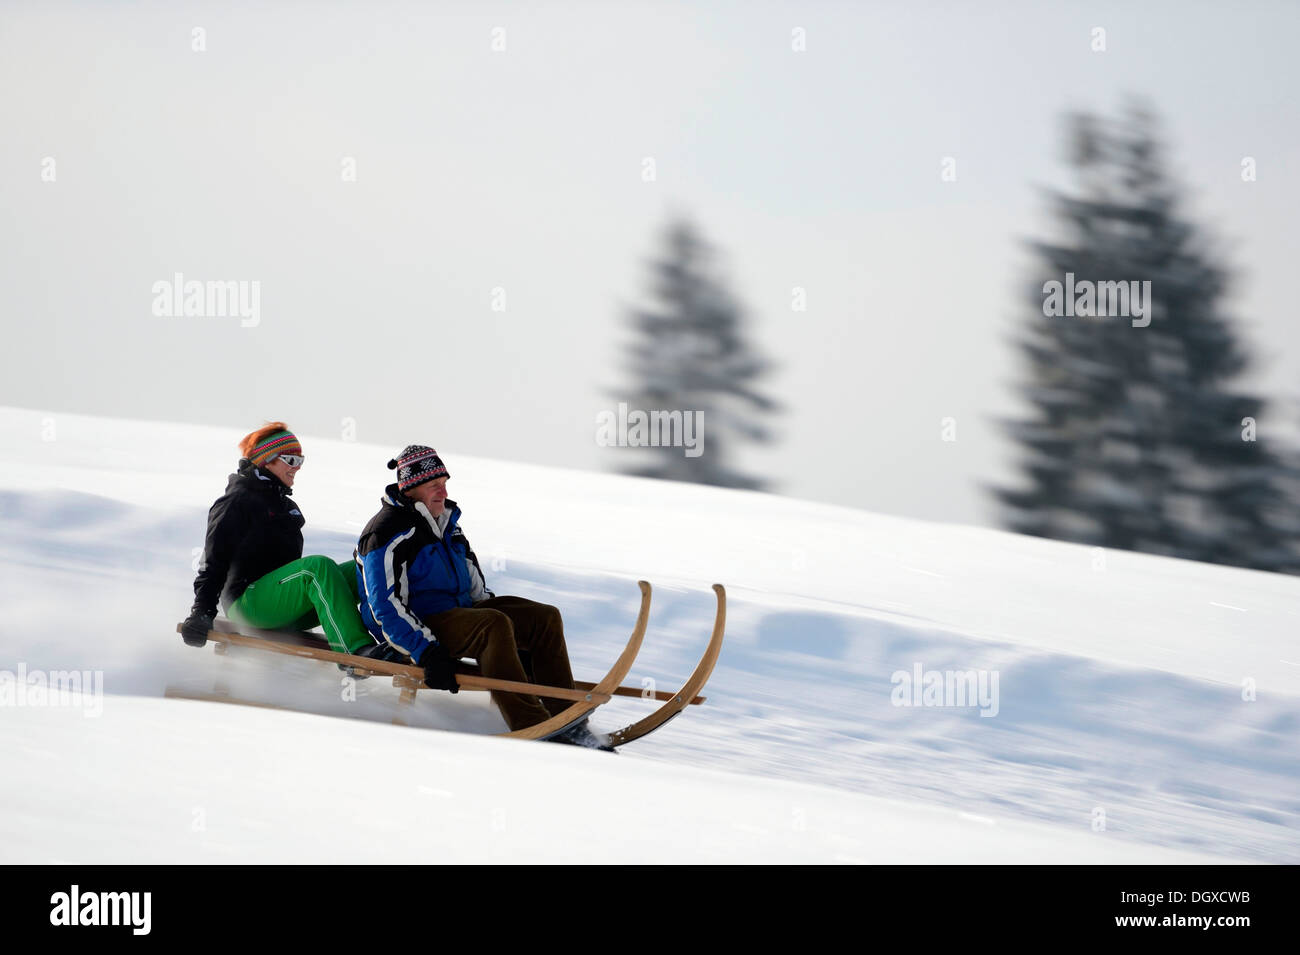 Horn sledge at full speed, Gunzesried, Oberallgäu, Bavaria, Germany - Stock Image